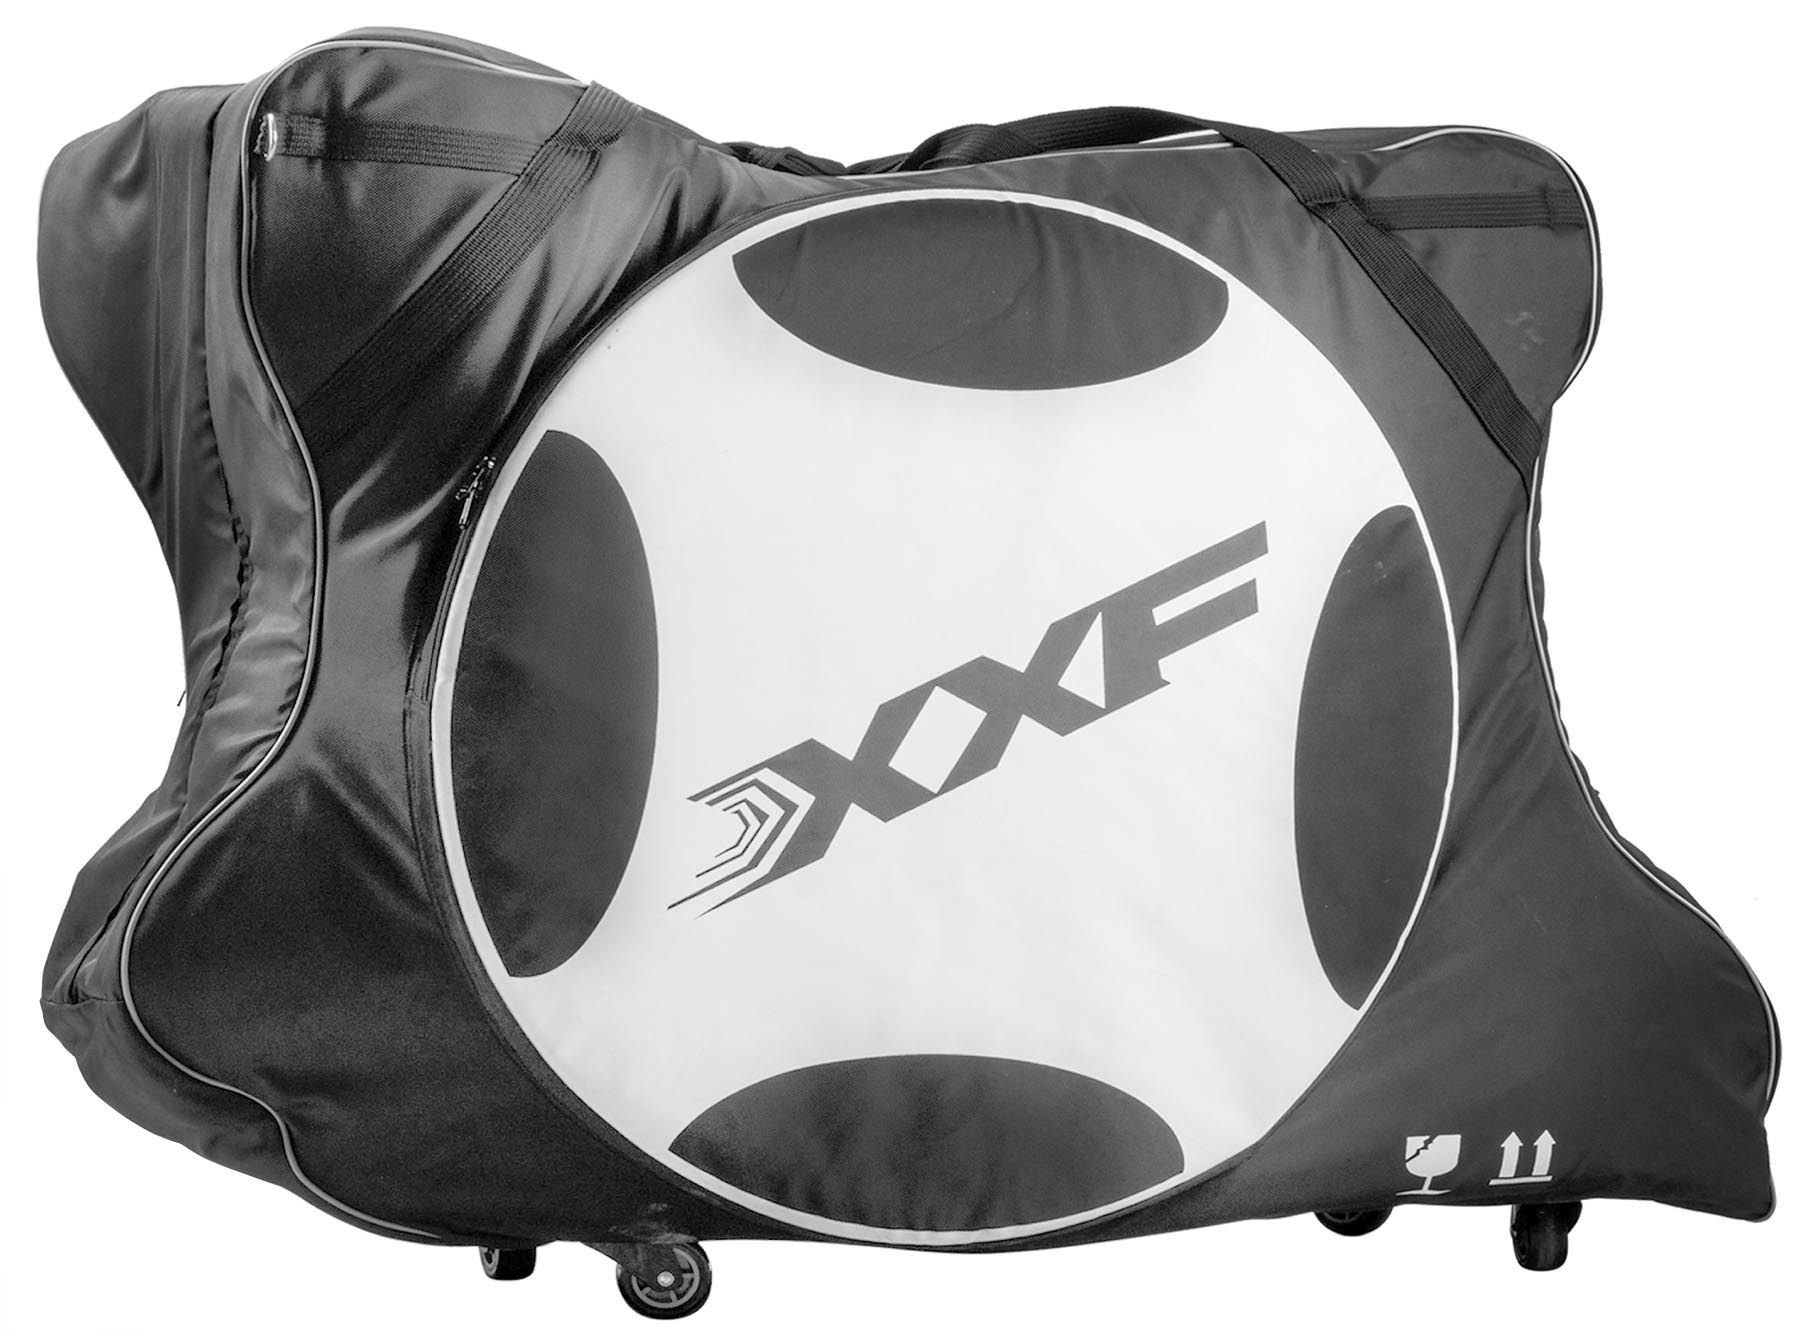 Transport Travel Bike Carry Bag Nylon Pad For 700c Road Bike 26'' 27.5''29'' MTB